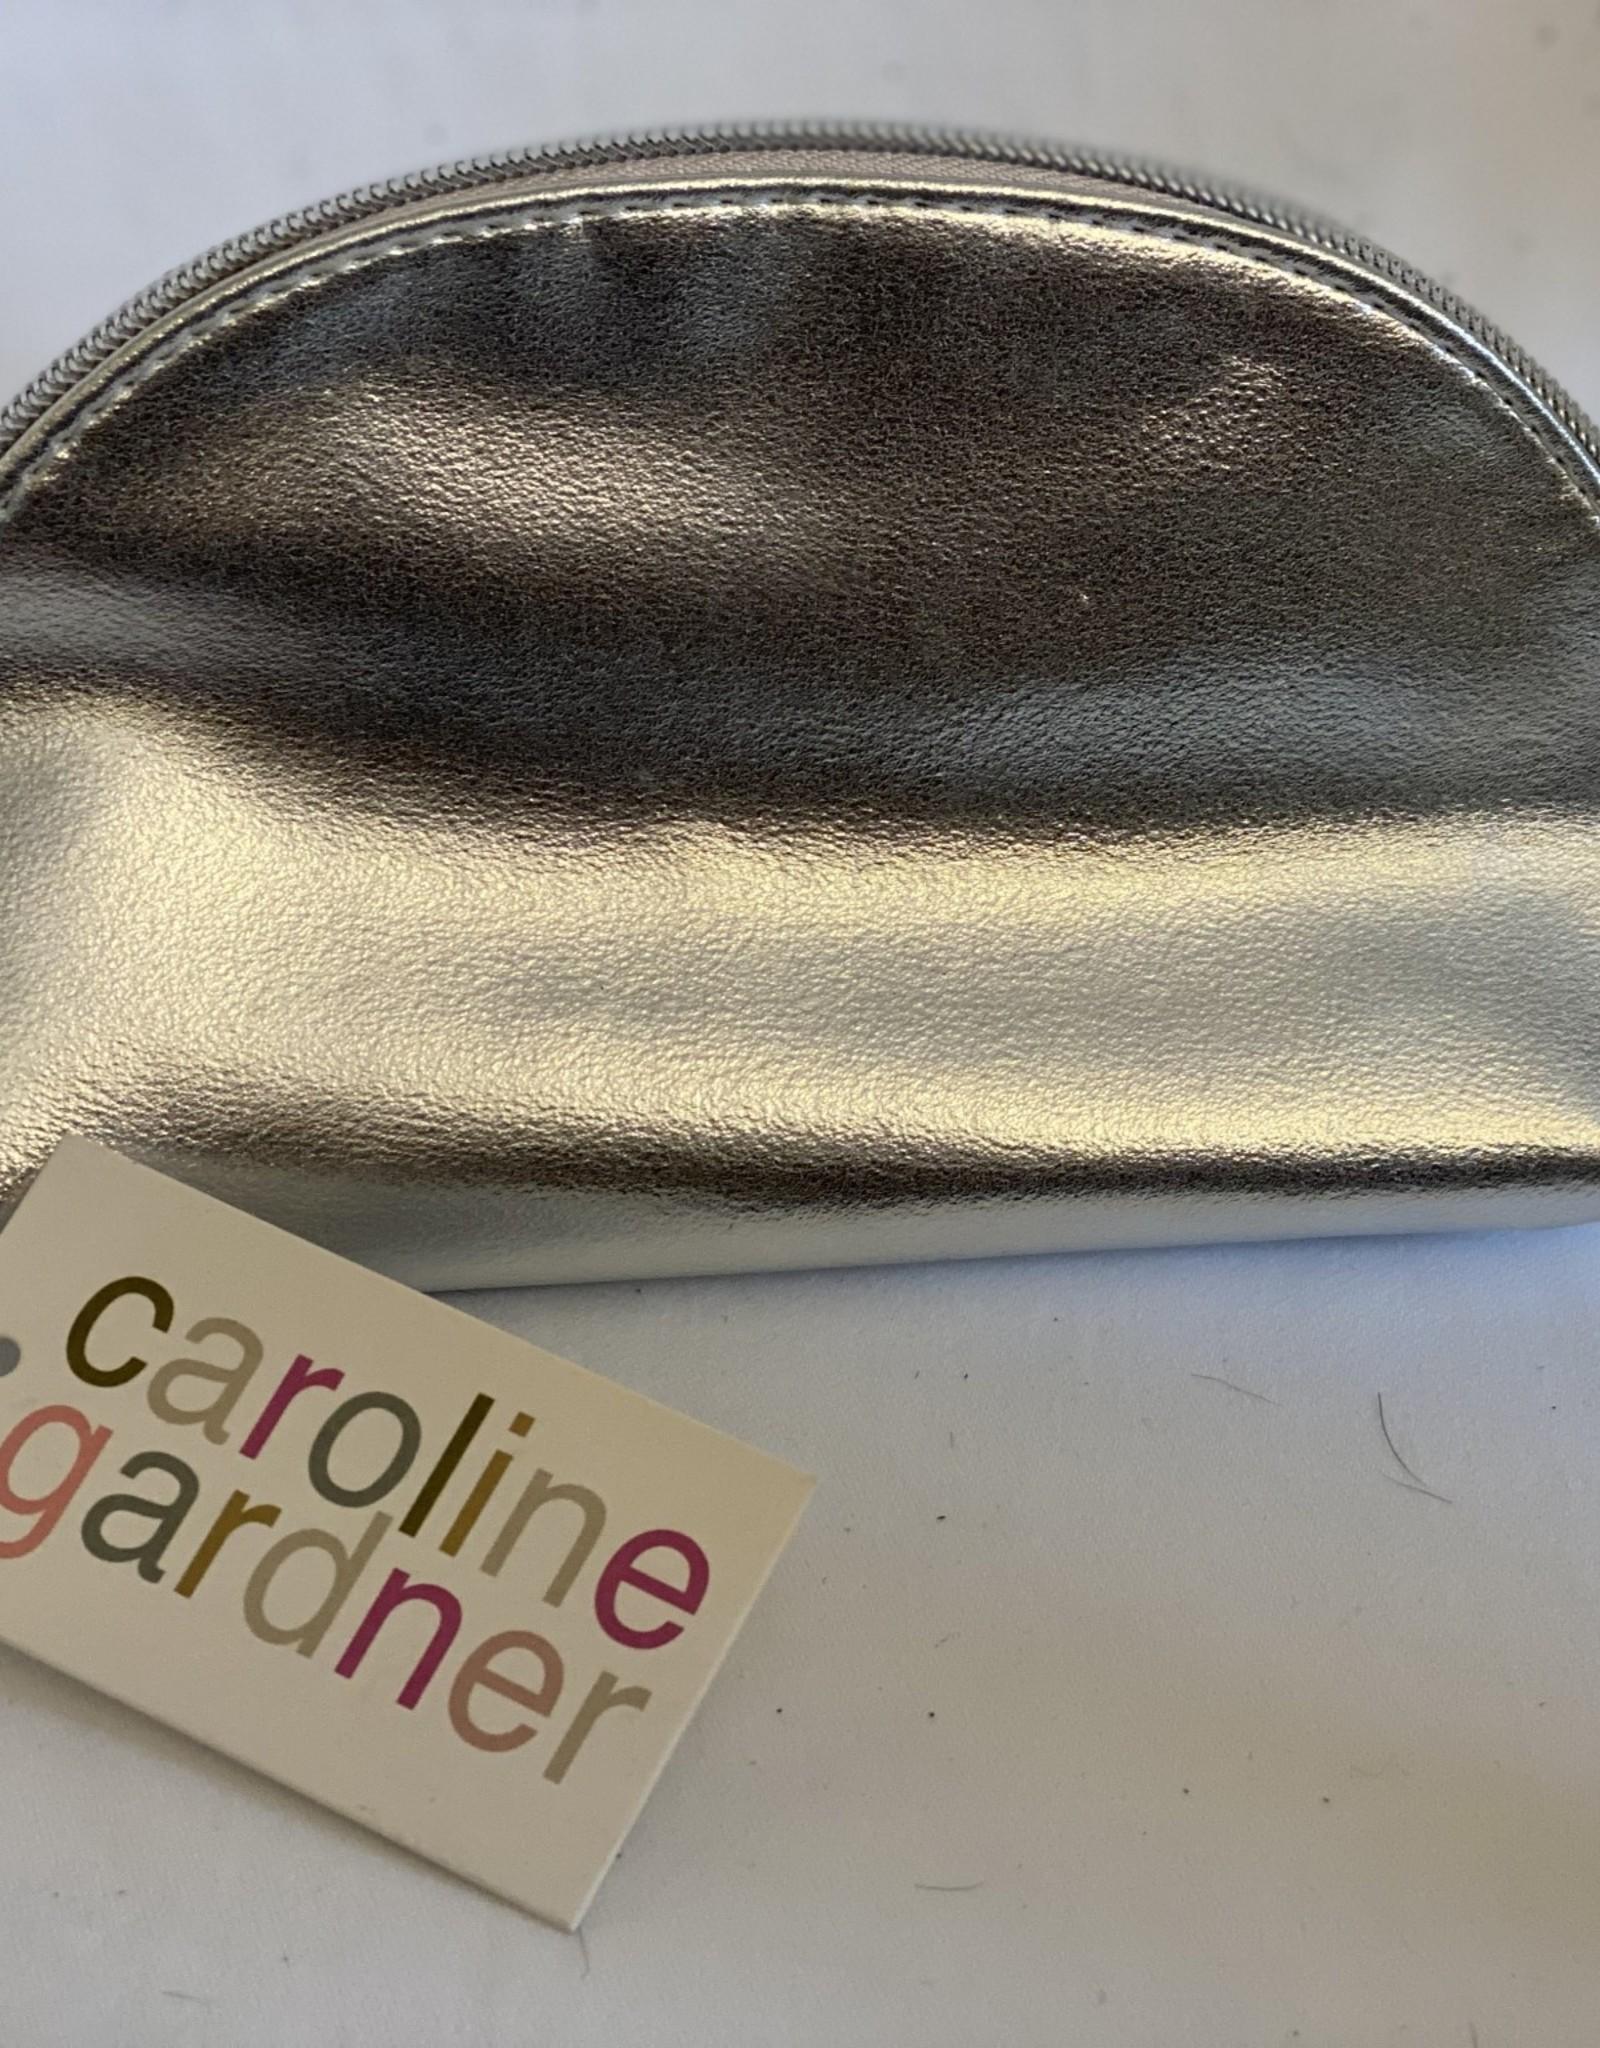 CAROLINE GARDNER HALF MOON COSMETIC BAG/POUCH  BY CAROLINE GARDNER